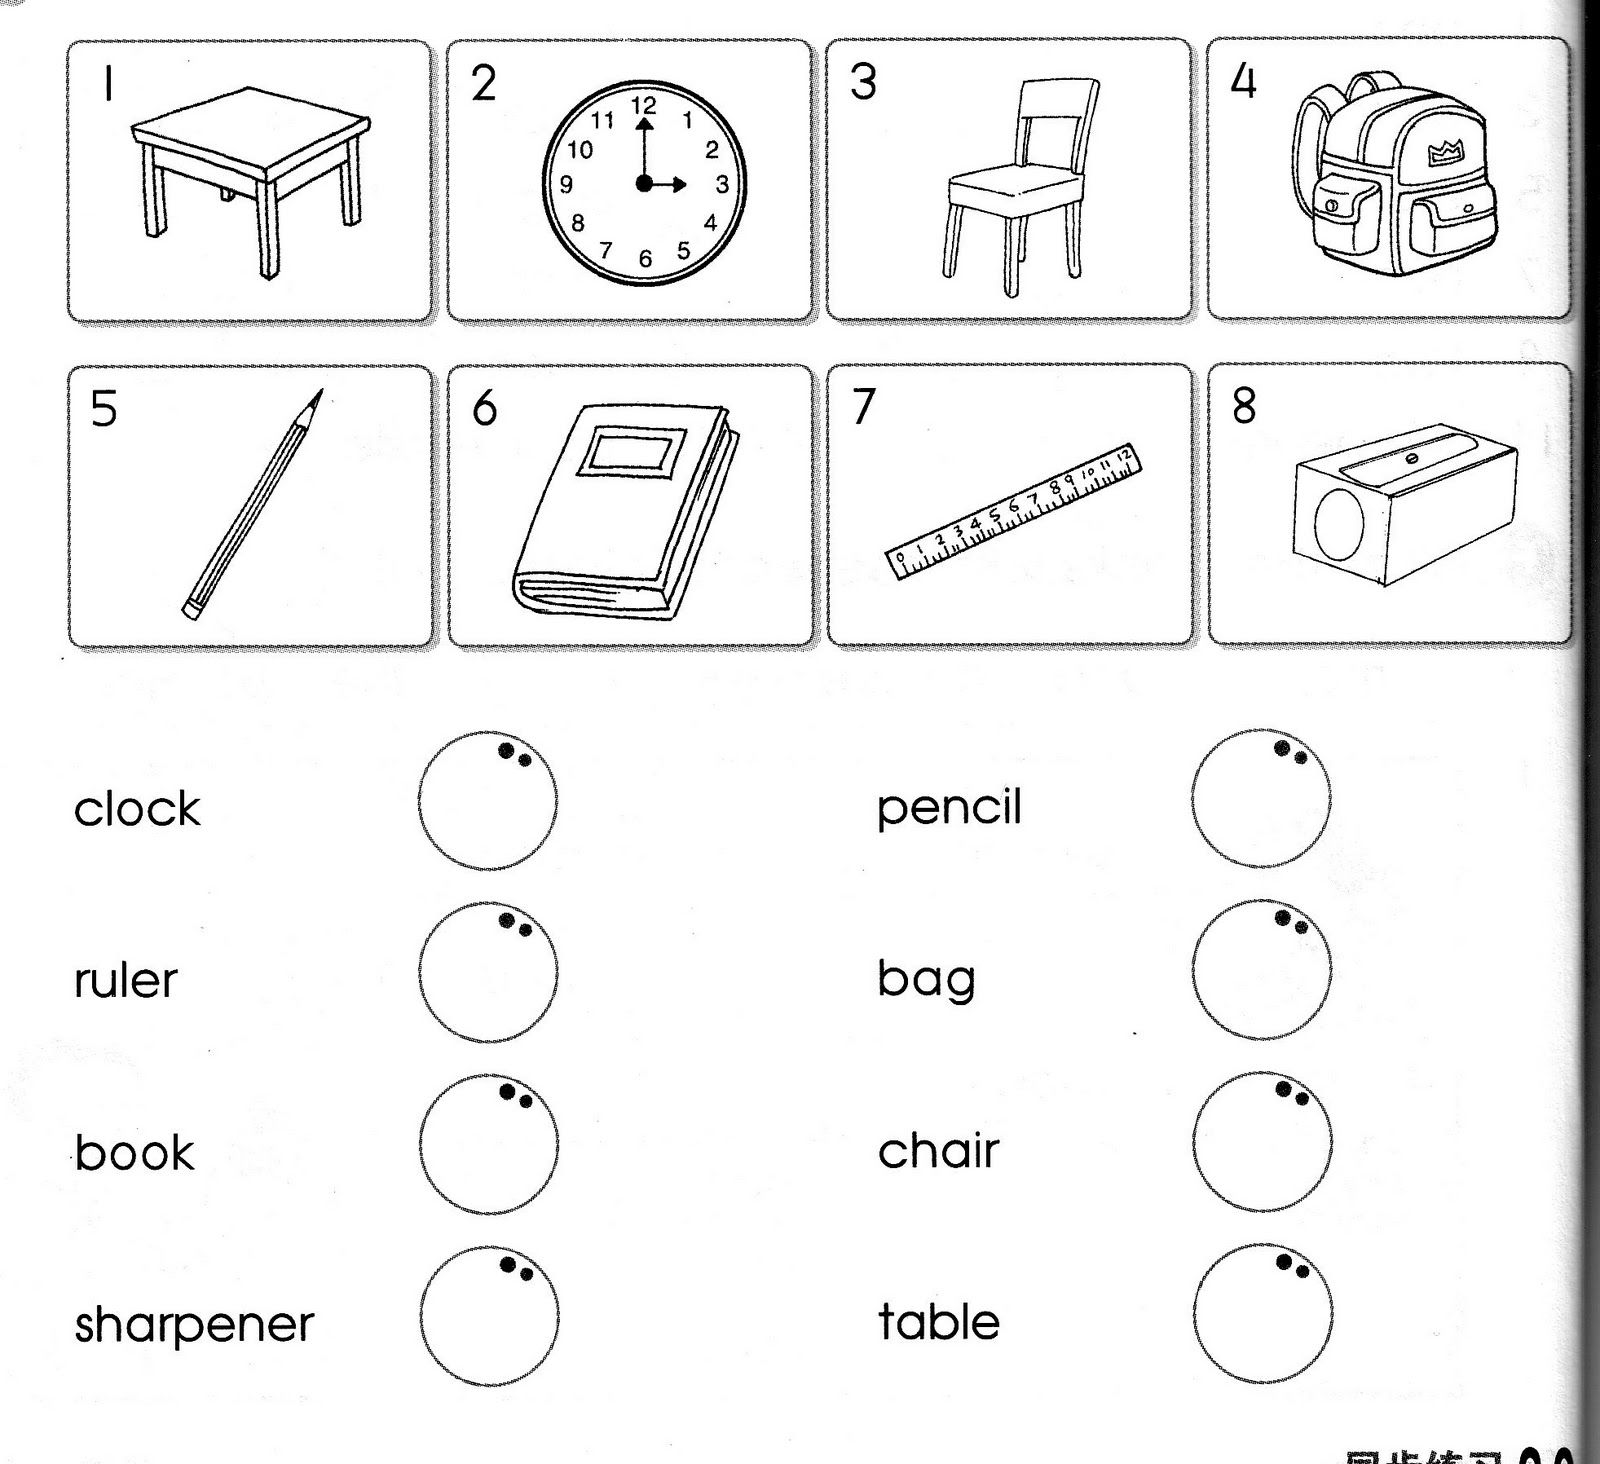 school things  Kindergarten worksheets, Kindergarten worksheets